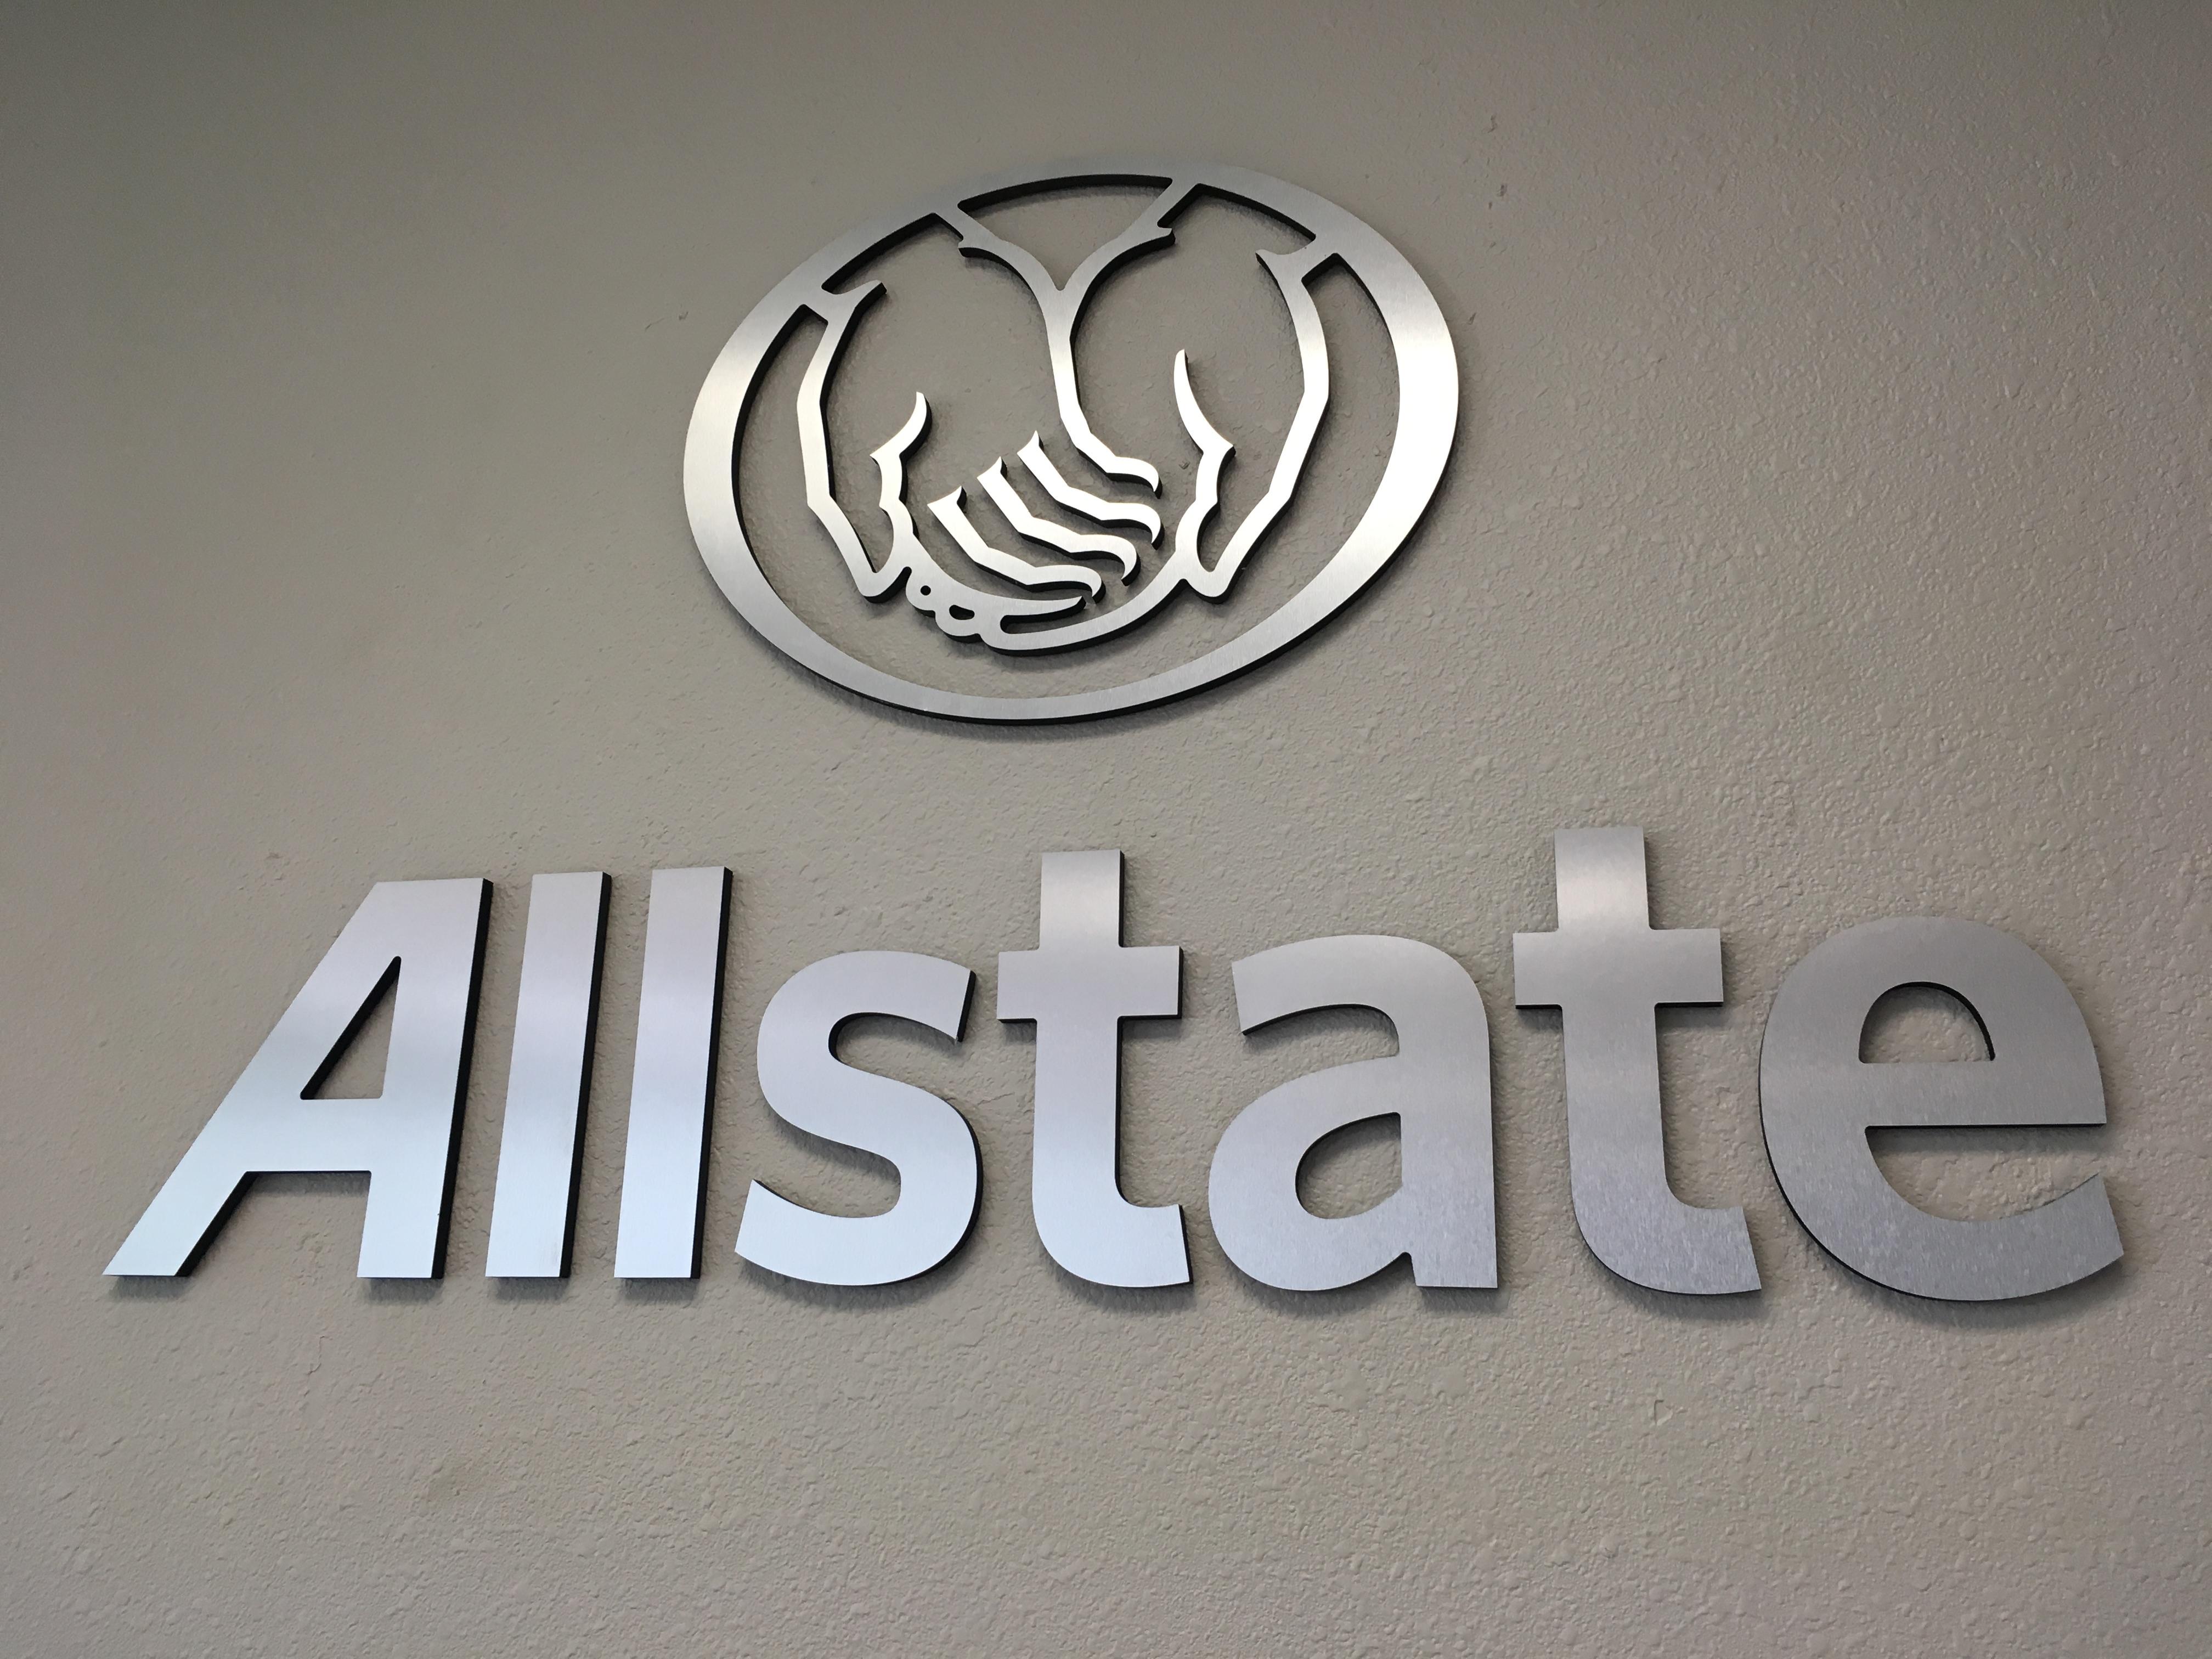 David D Harrington: Allstate Insurance, Boulder Colorado ... Allstate